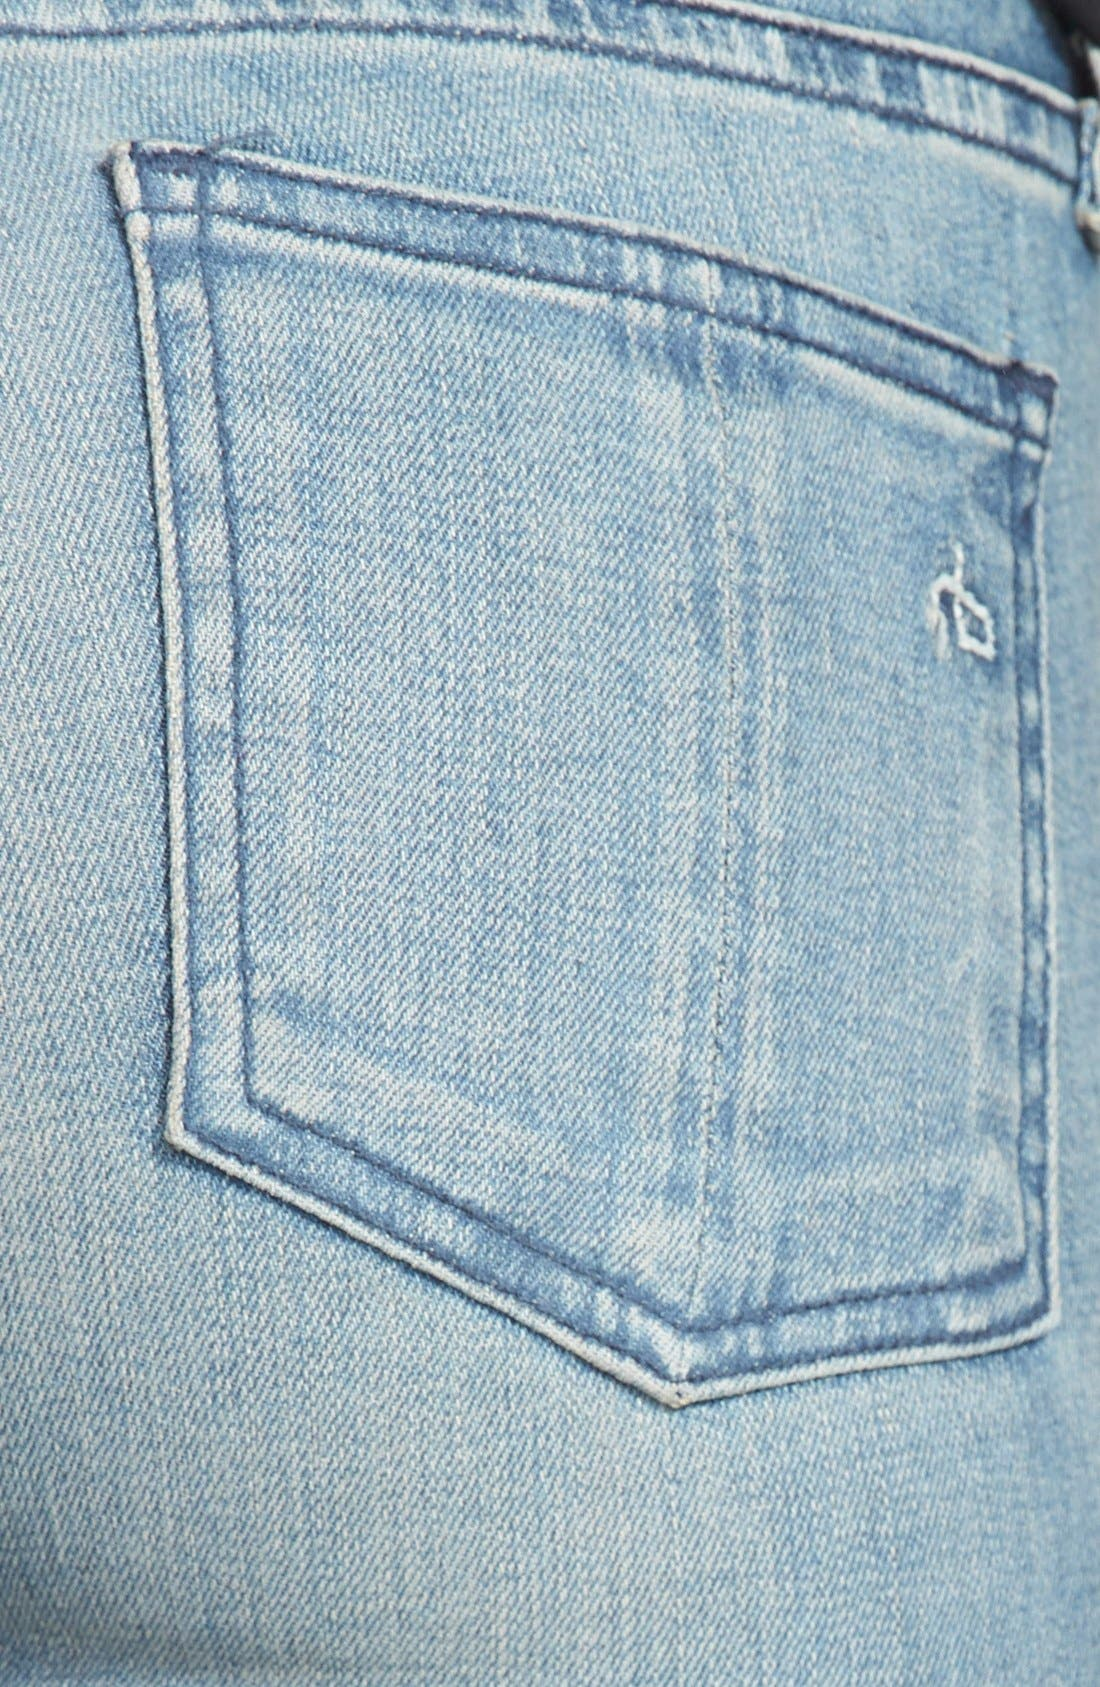 Alternate Image 3  - rag & bone/JEAN 'Samurai Legging' Skinny Jeans (Cardiff)